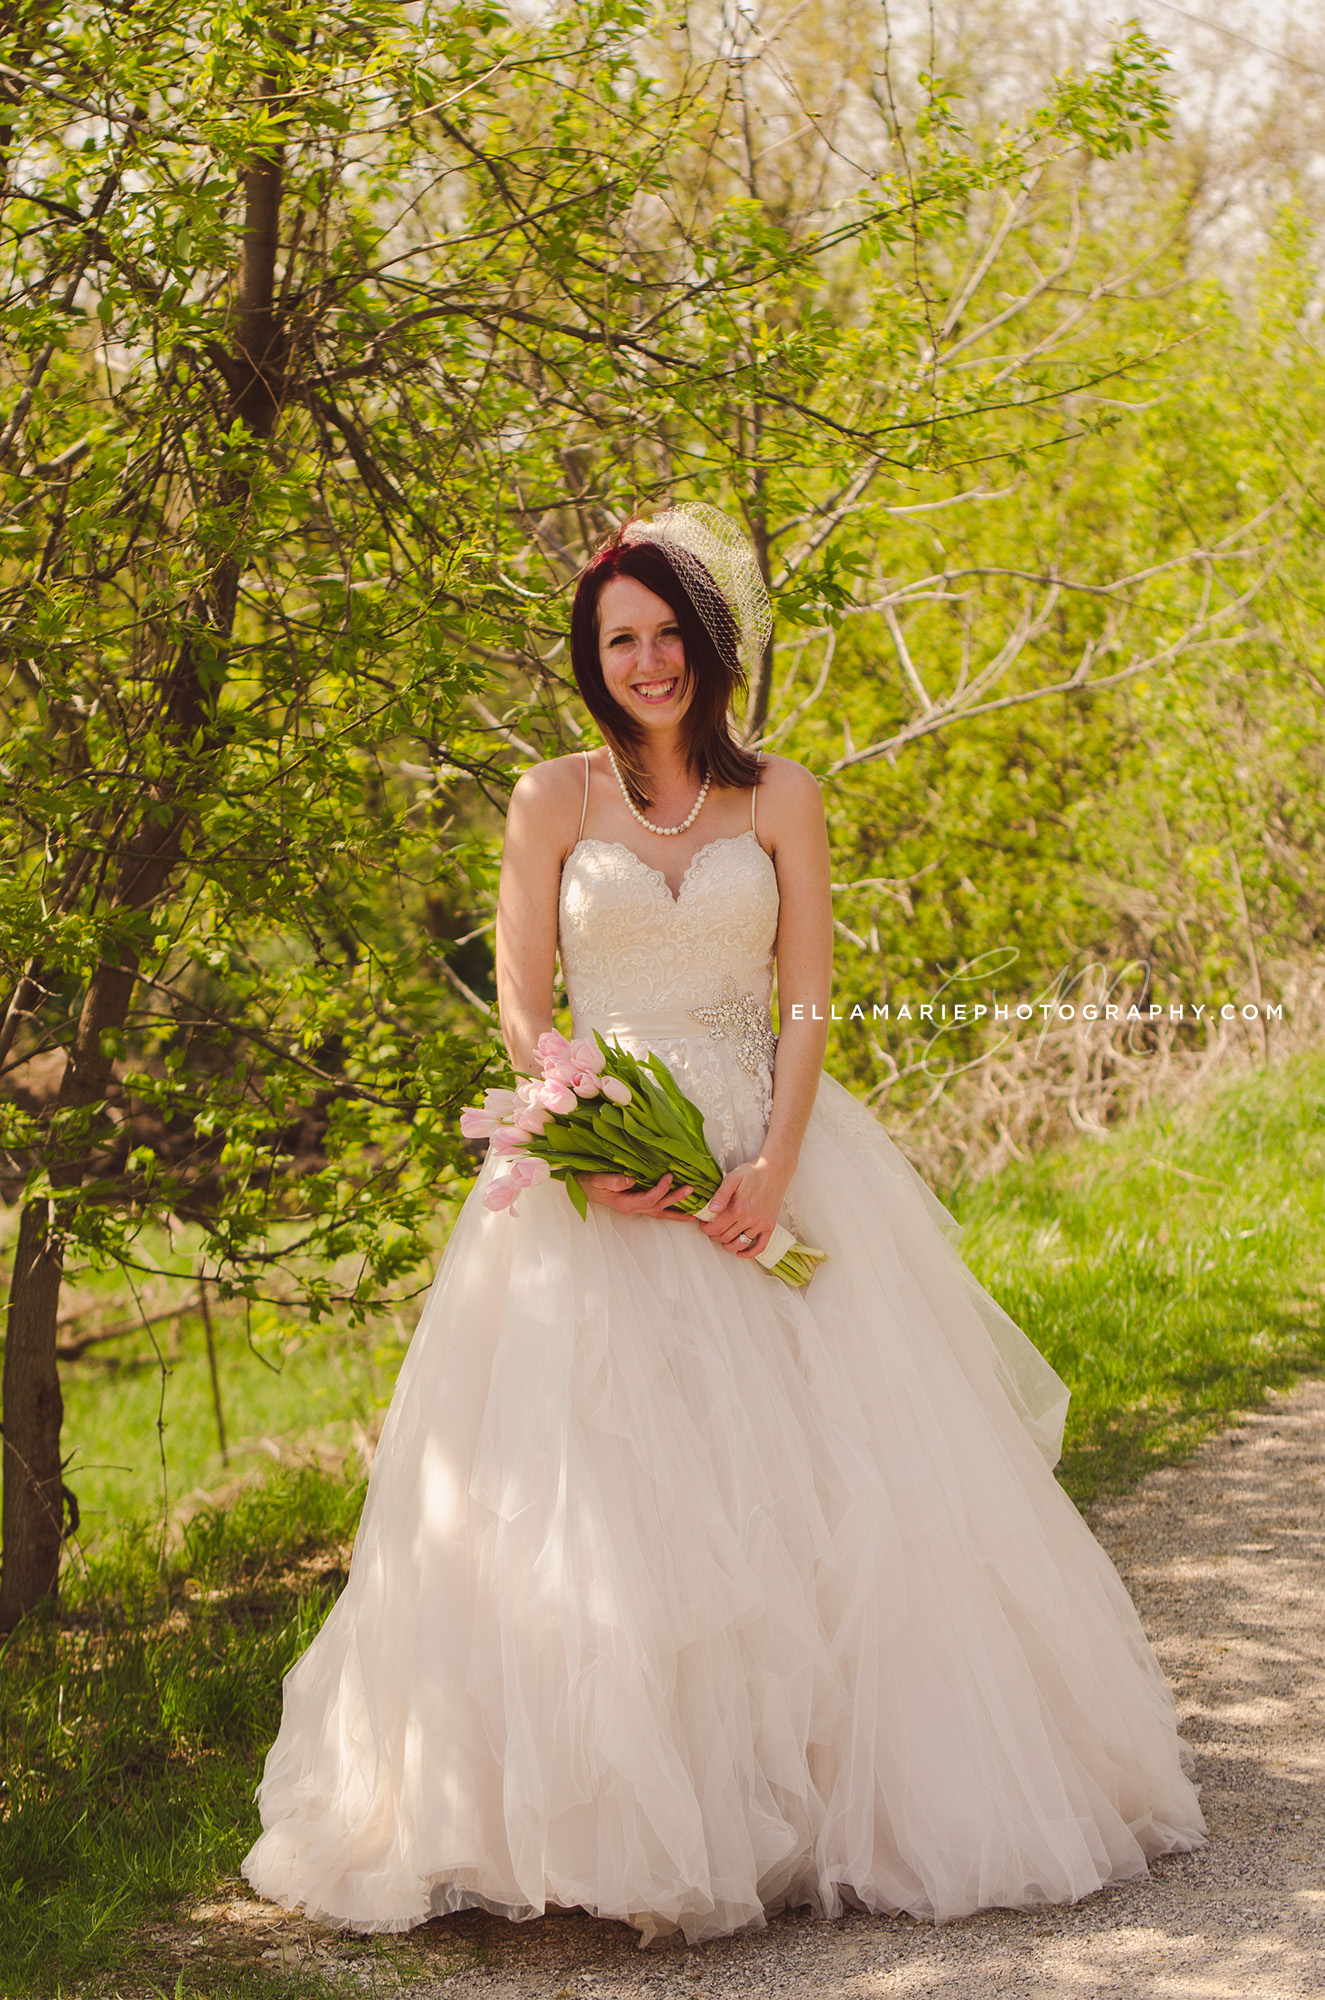 EllaMariePhotography_wedding_Baden_ON_New_Hamburg_Stratford_Waterloo_Kitchener_Guelph_Cambridge_Listowel_photographer_photography_06.jpg